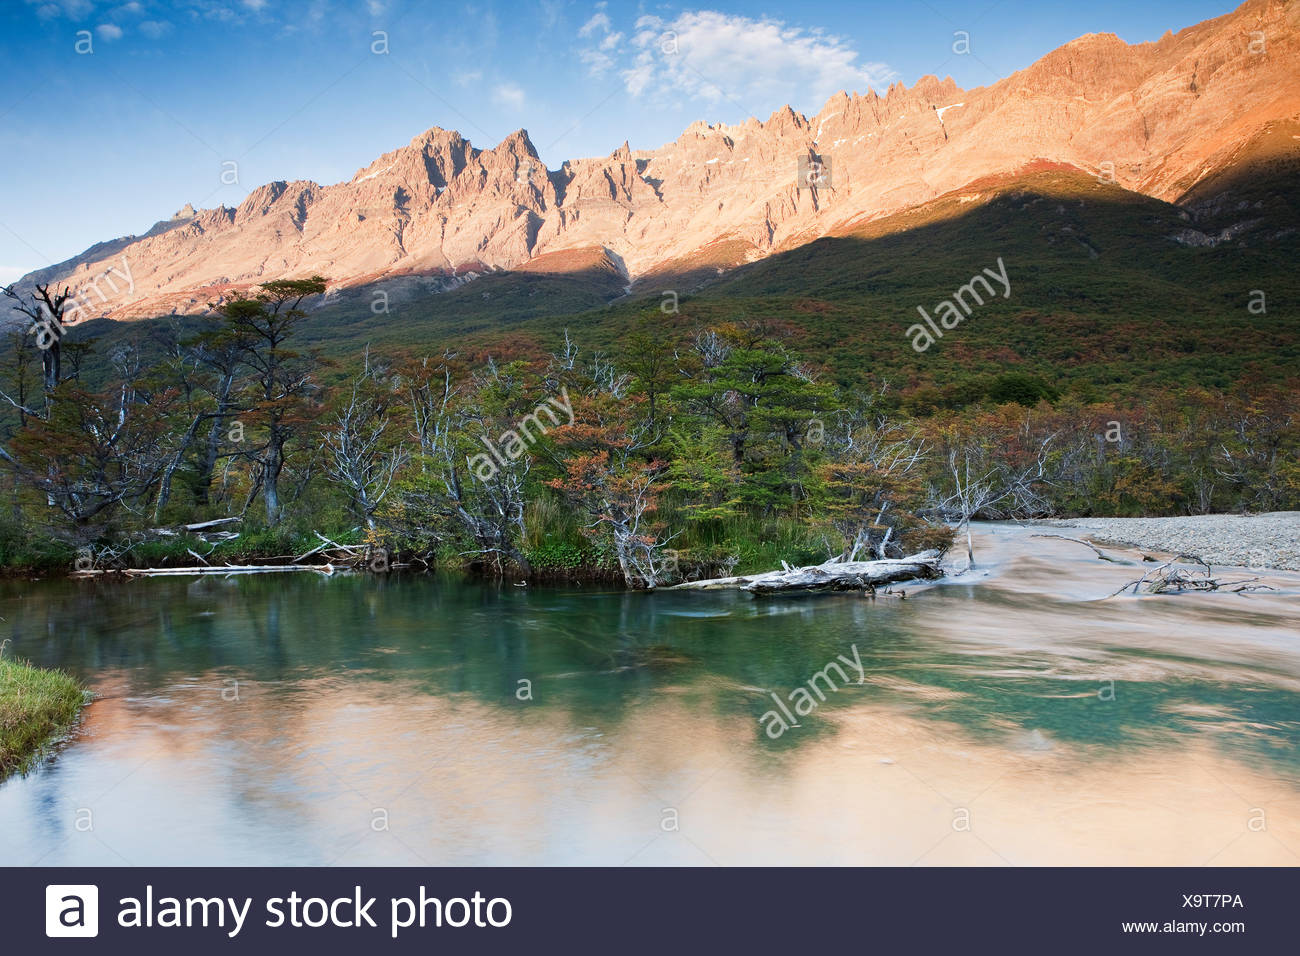 Los Glaciares National Park, Patagonia, South America - Stock Image